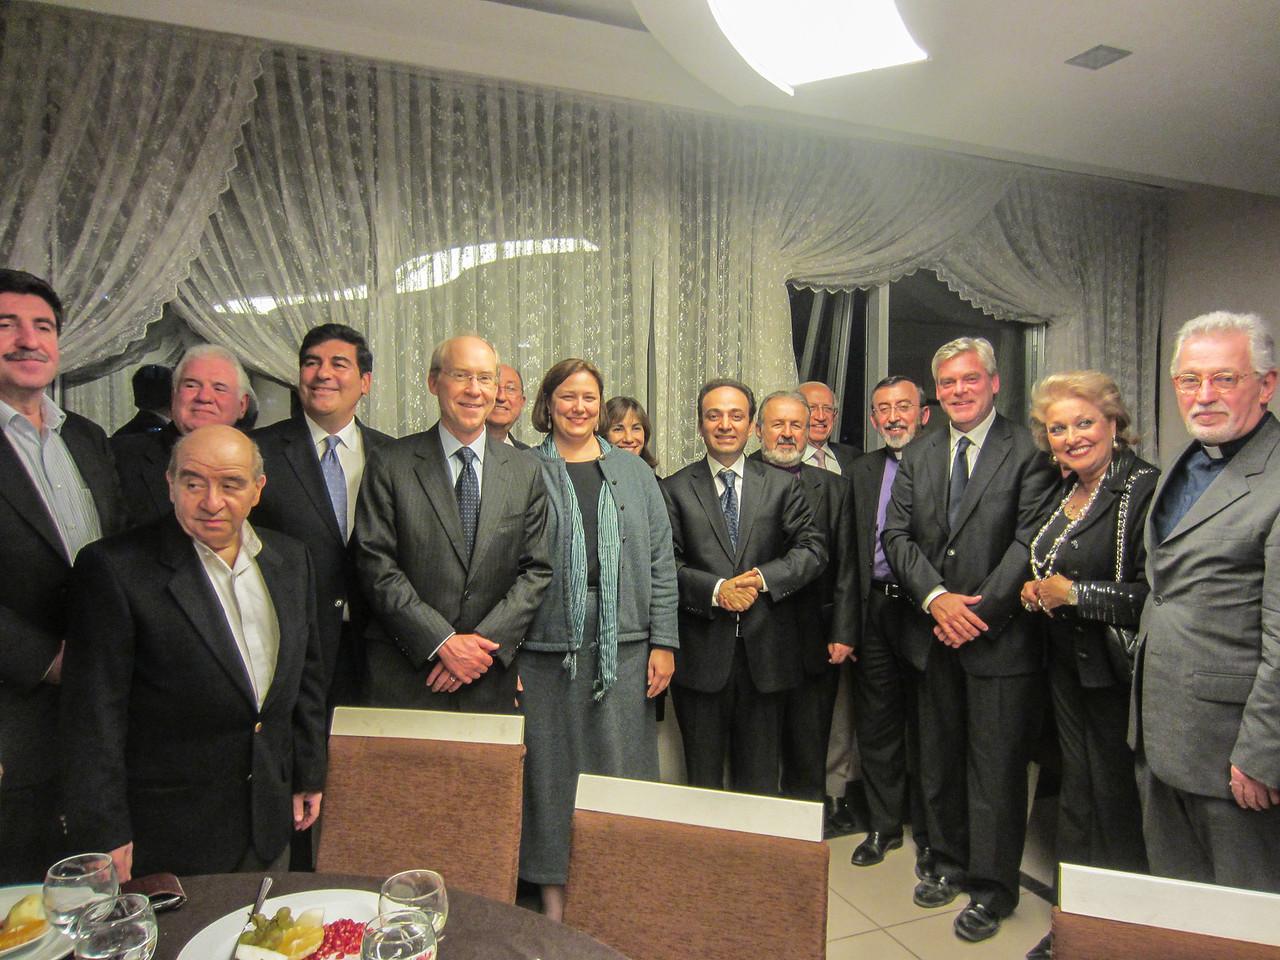 Diyarbakır Mayor's Dinner iho Armenian-American Delegation